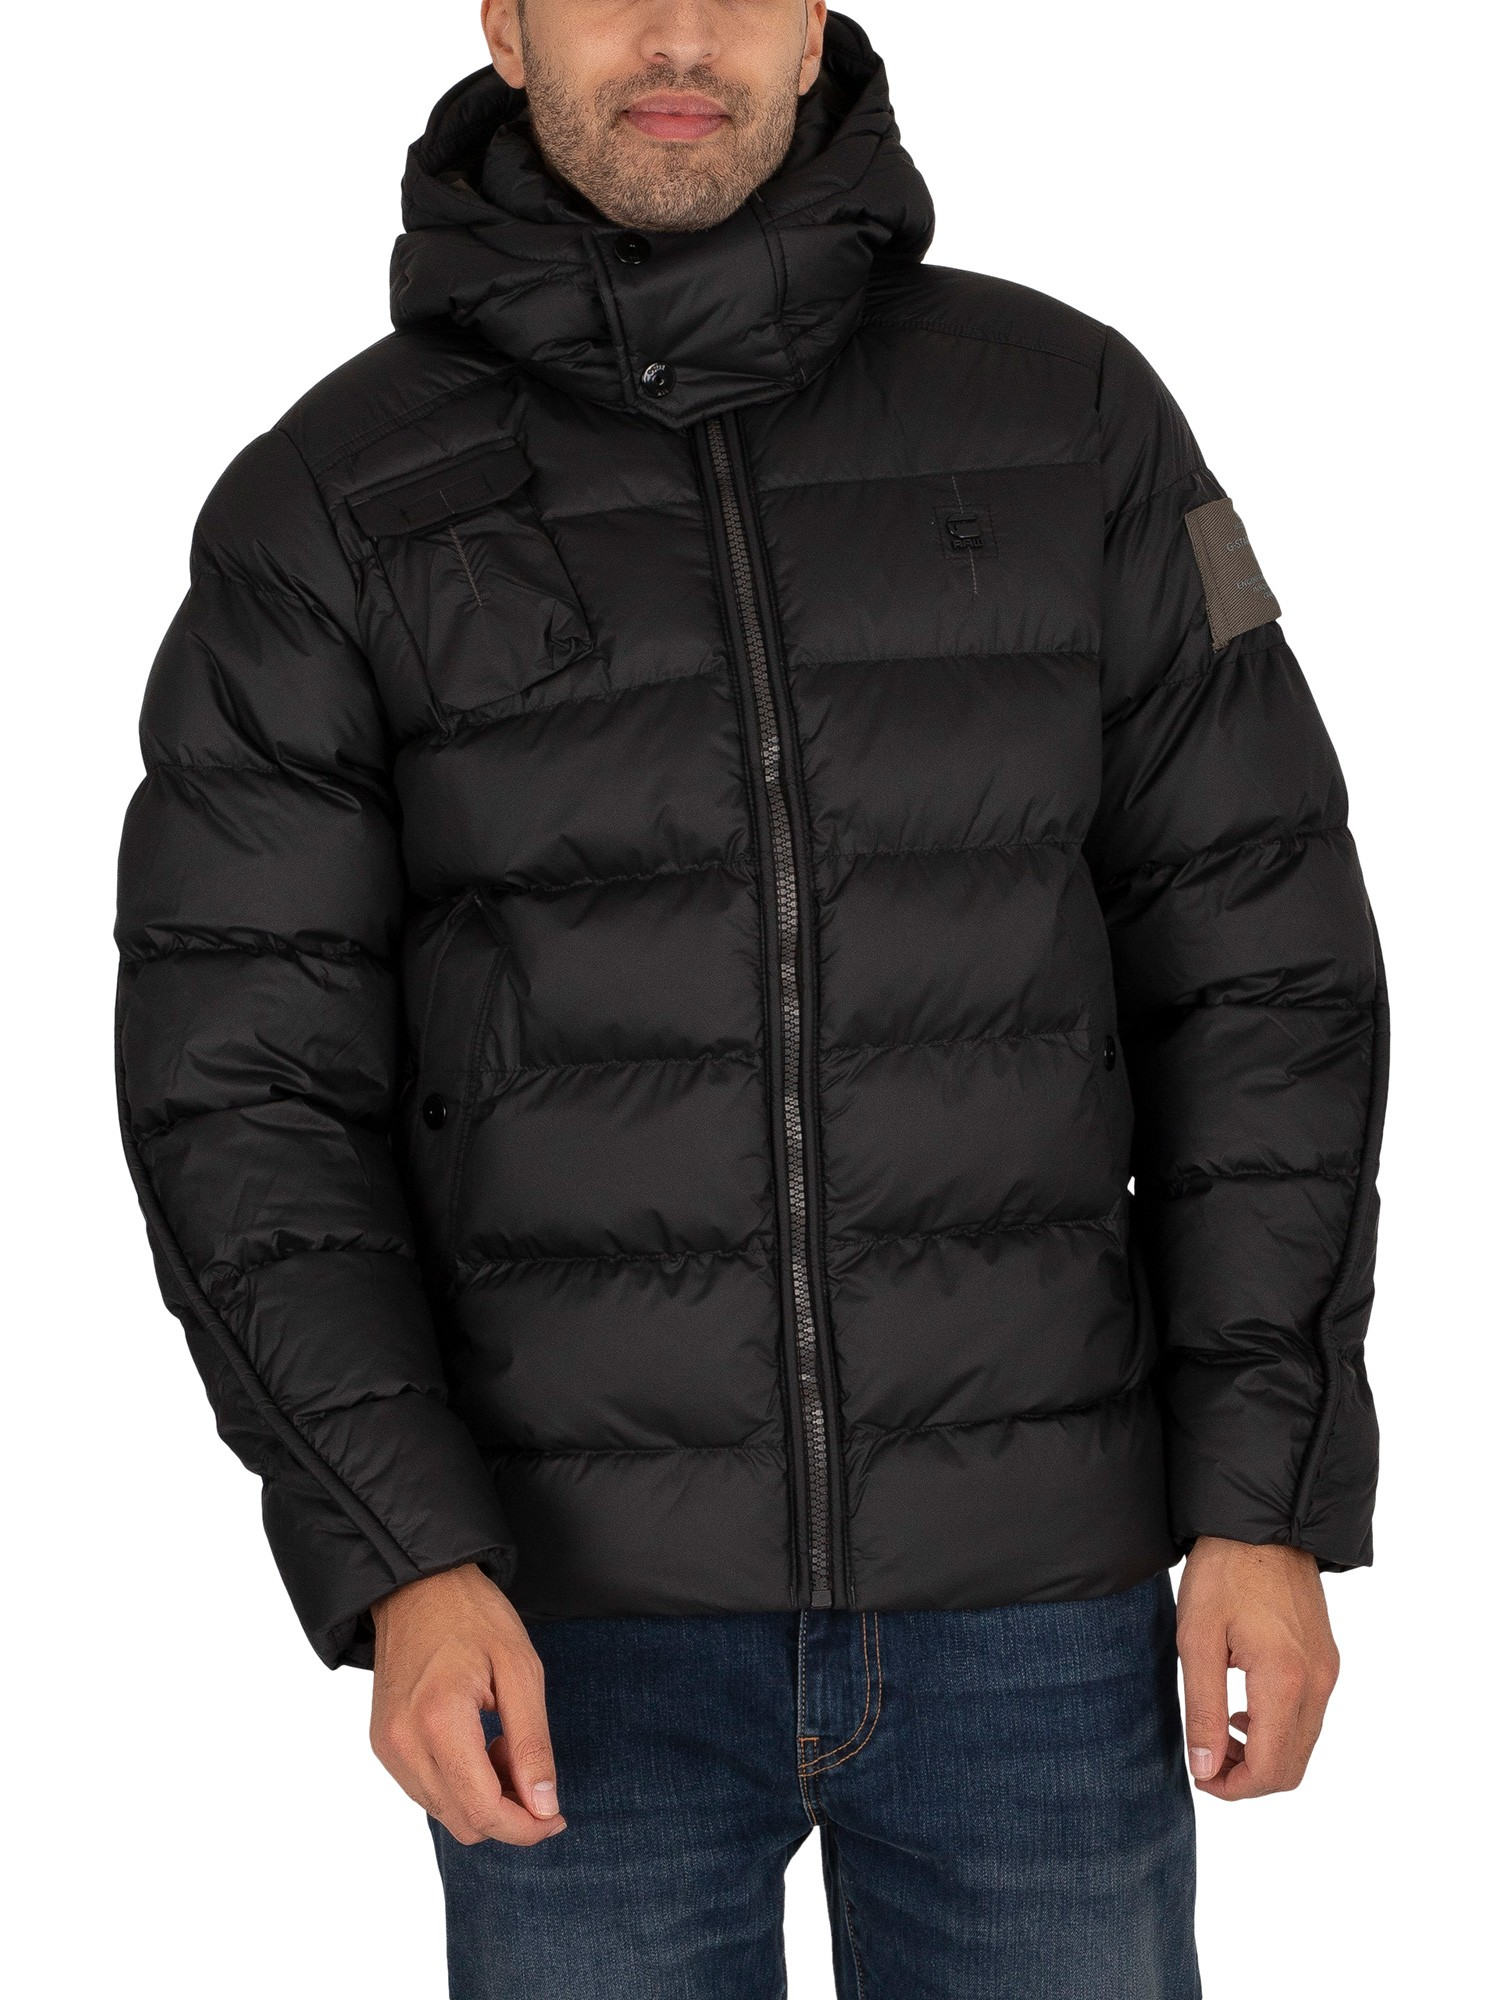 Whistler-Jacket